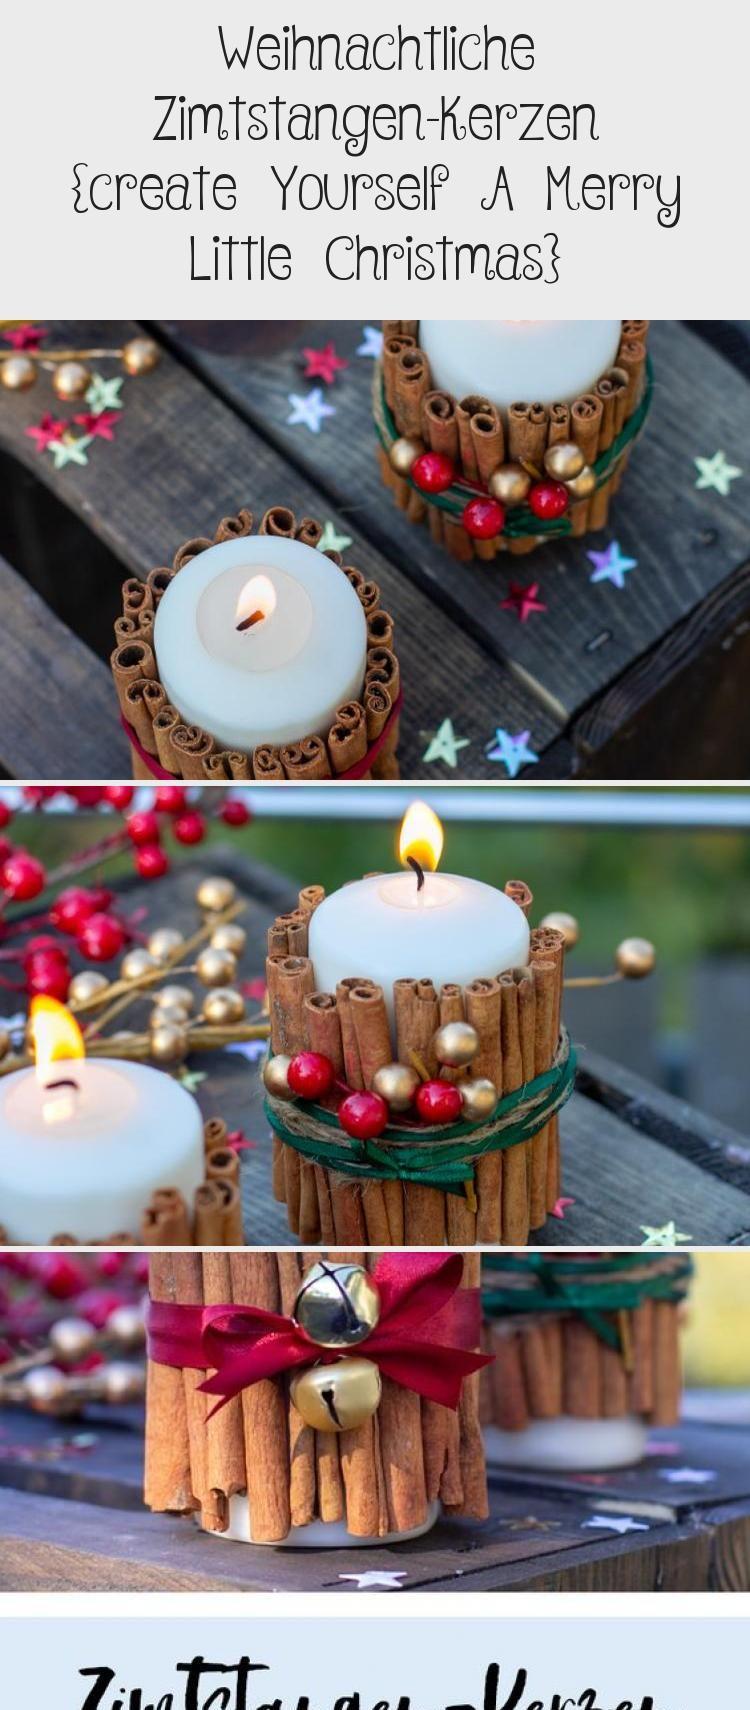 Weihnachtliche Zimtstangen Kerzen Create Yourself A Merry Little Christmas In 2020 Love Decorations Merry Little Christmas Christmas